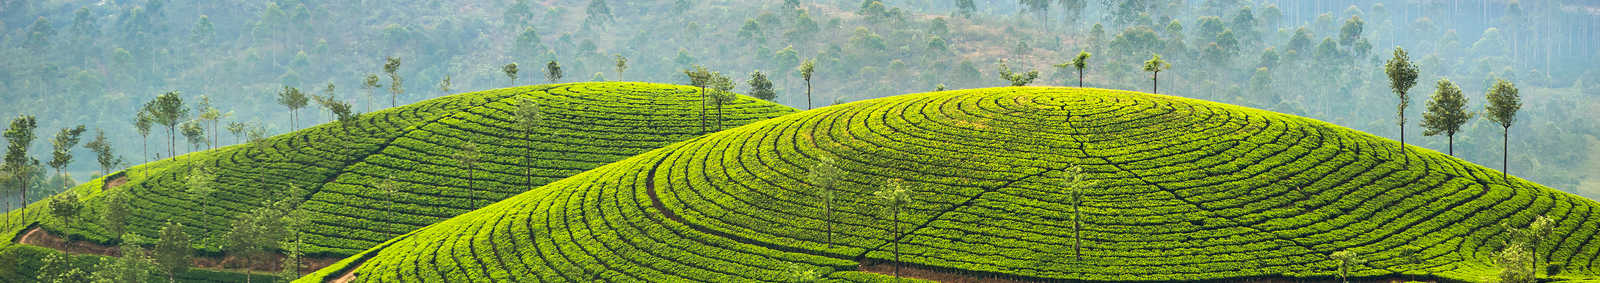 Sri Lanka Rice Paddies